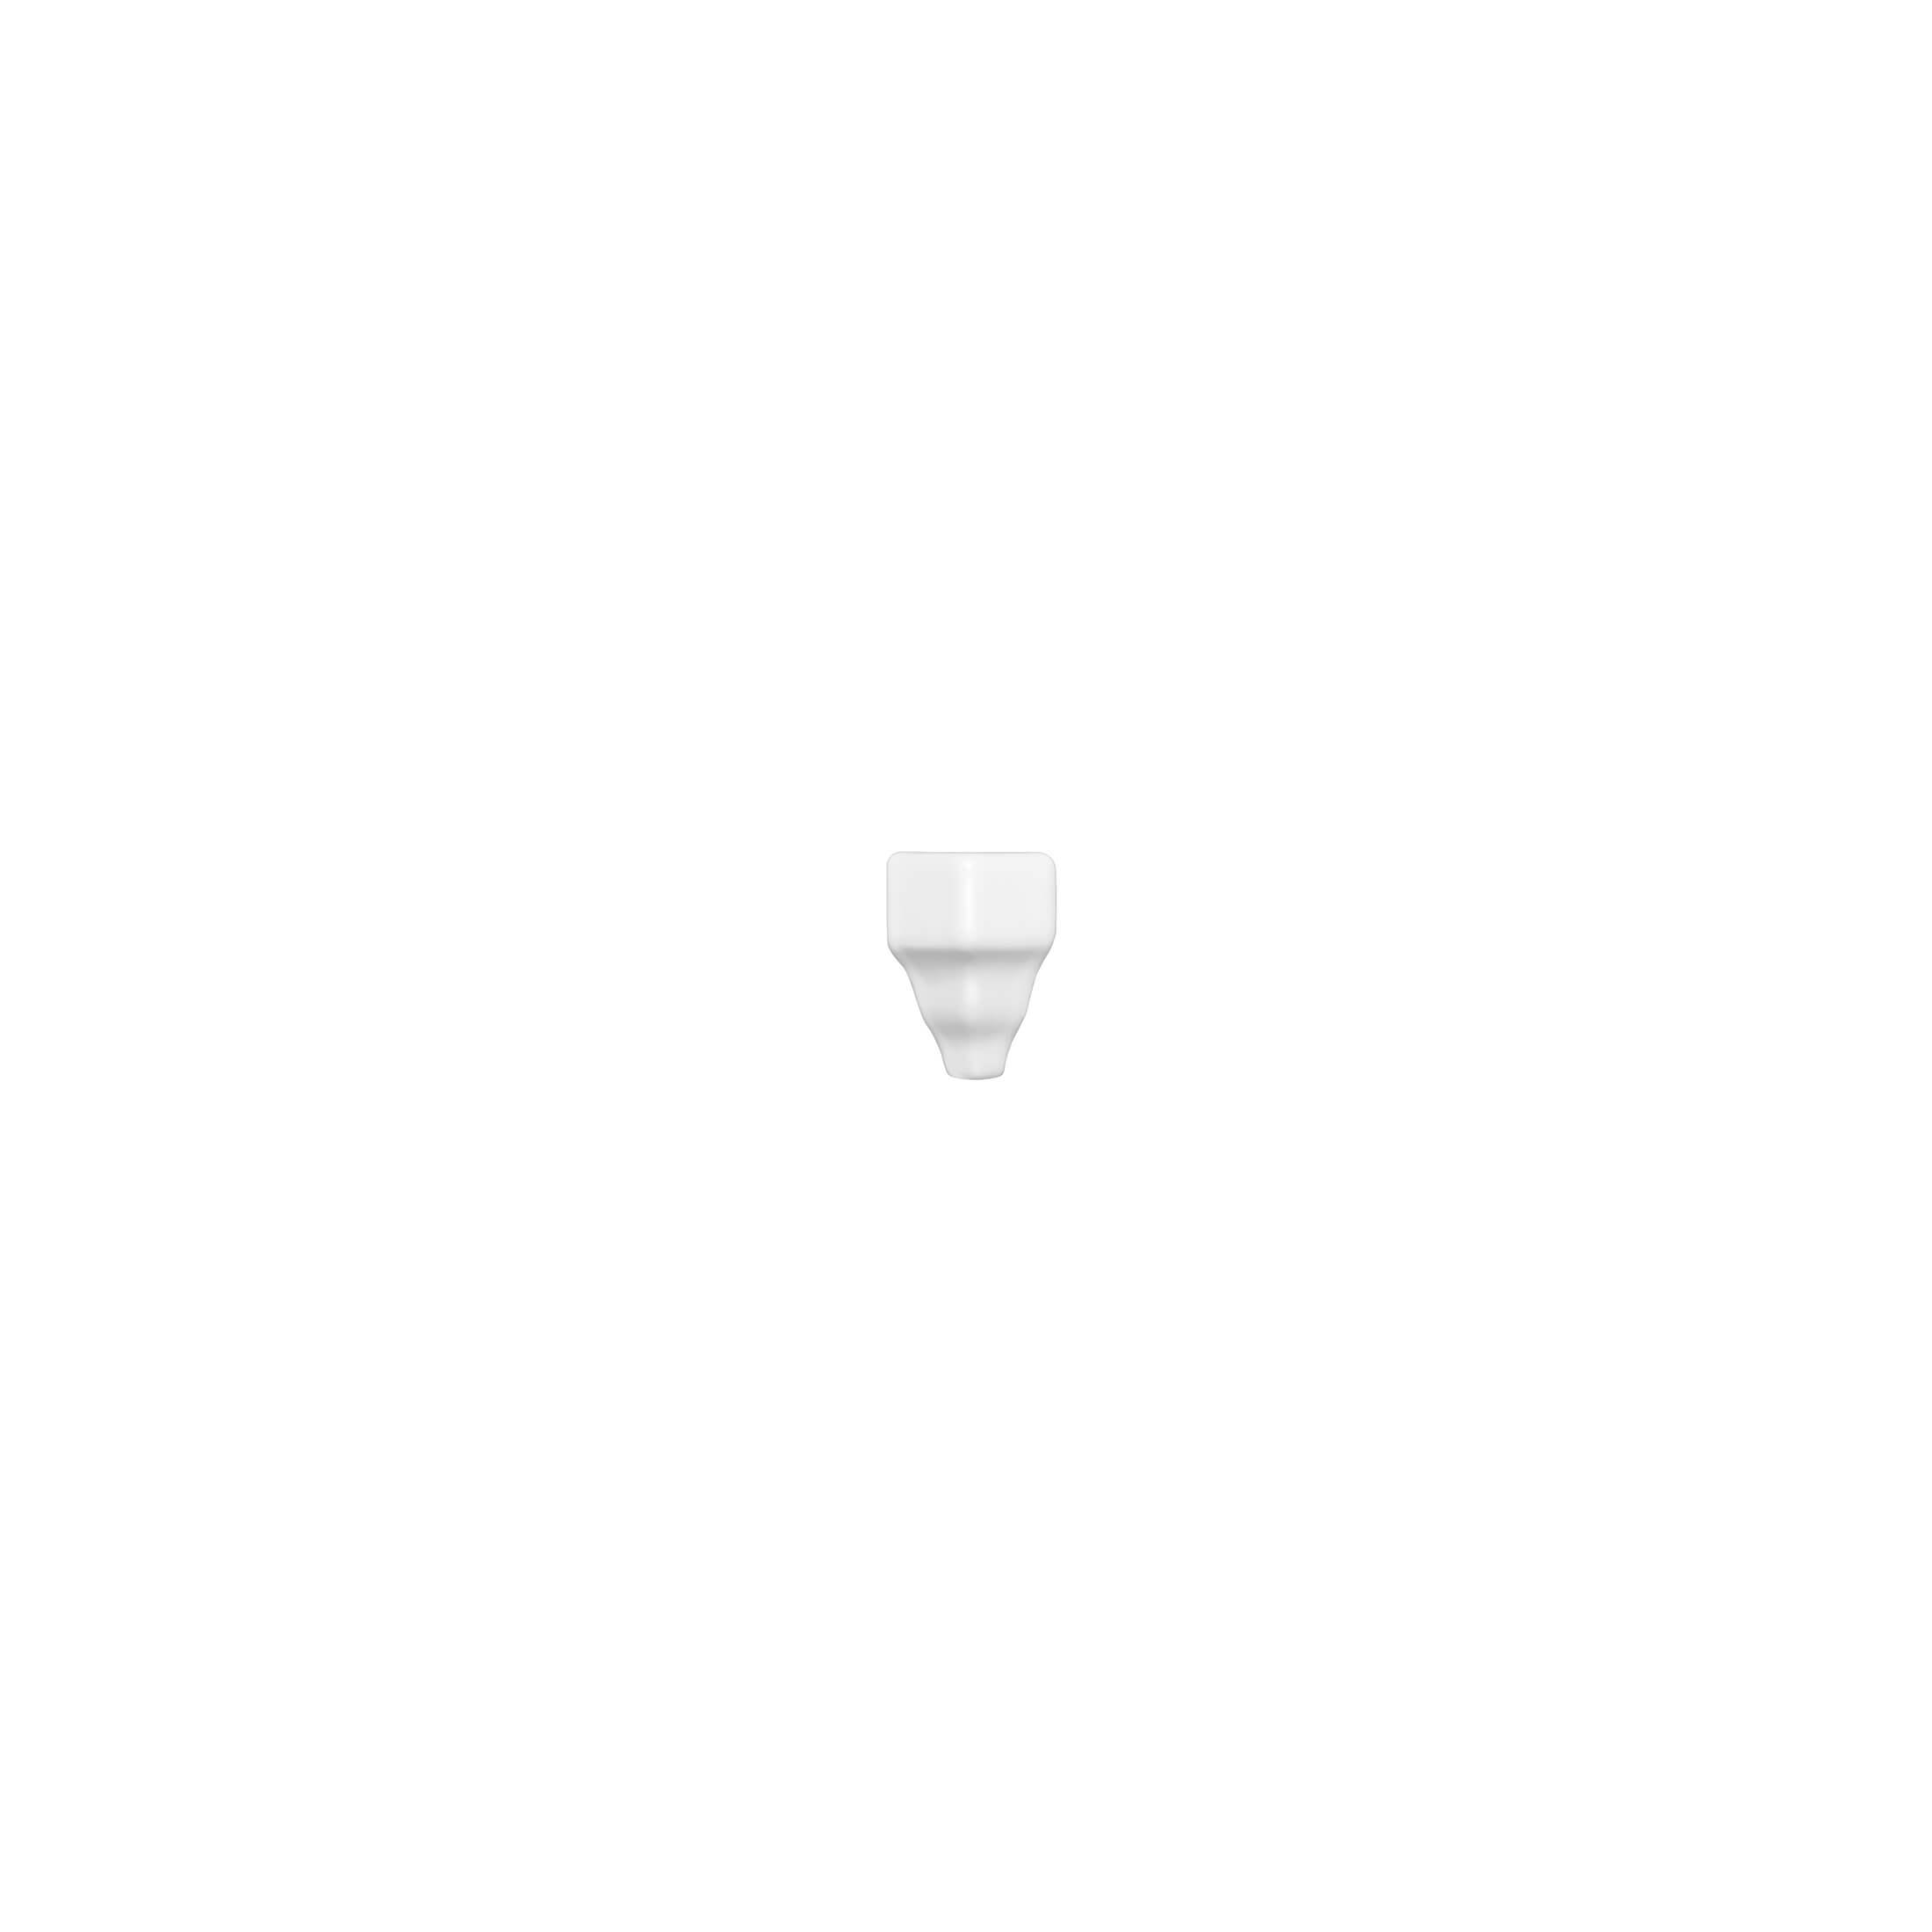 ADNE5376 - ANGULO EXTERIOR CORNISACLASICA - 3.5 cm X 15 cm